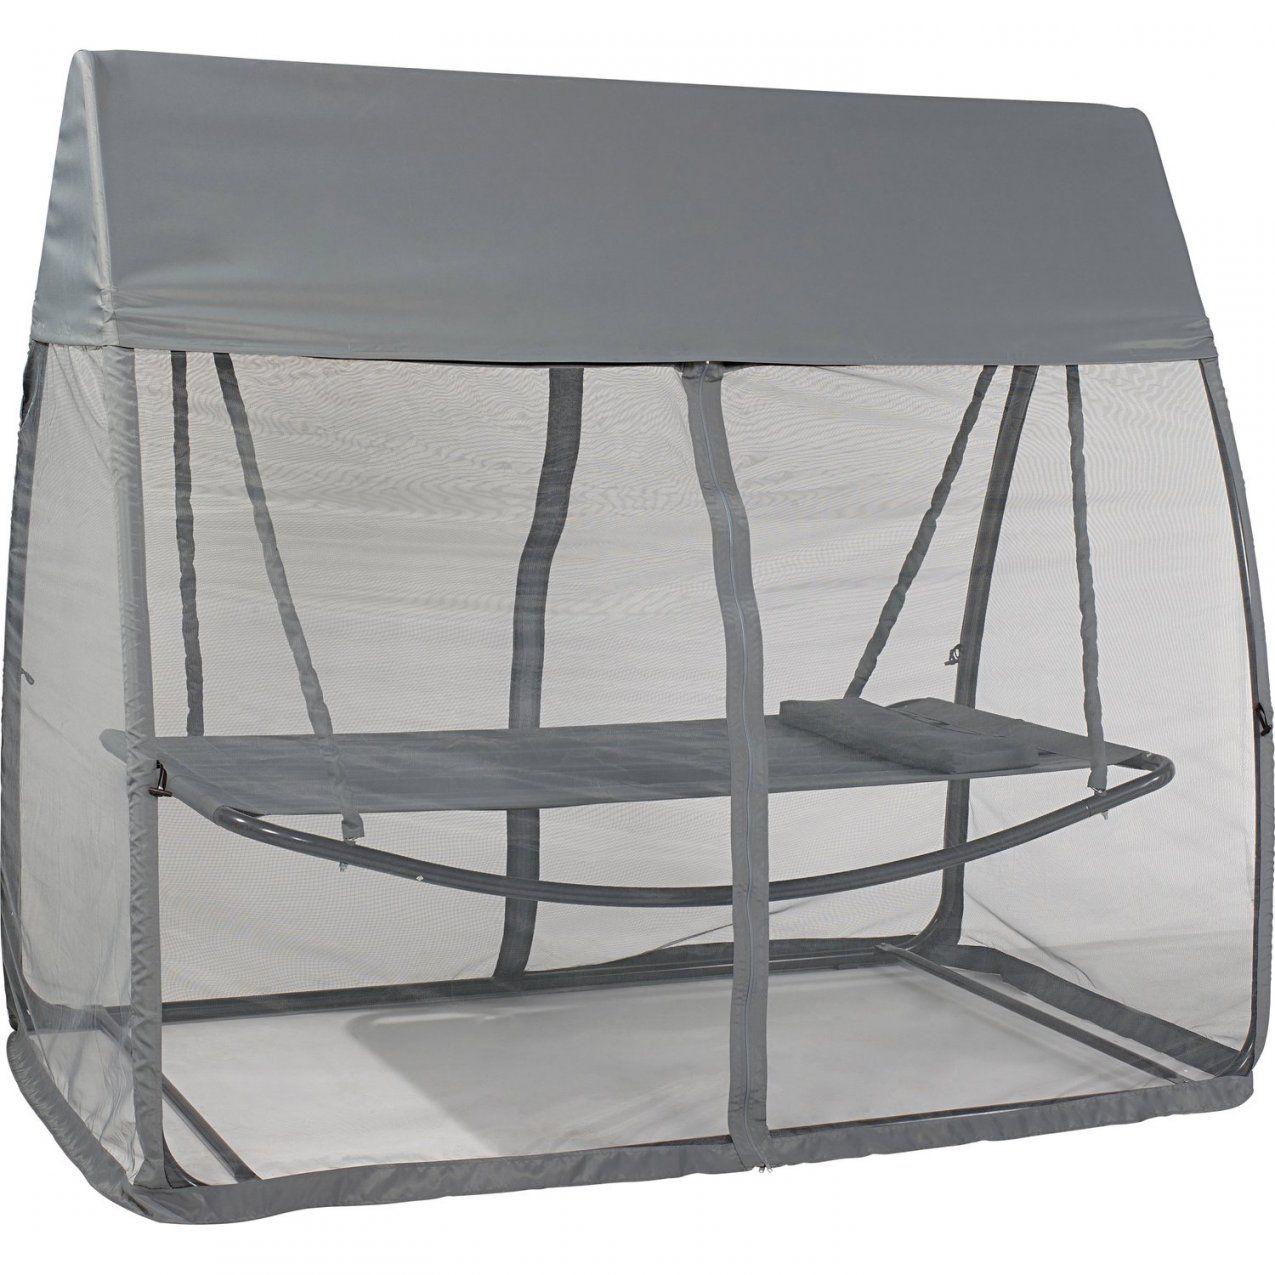 h ngematte mit gestell obi haus design ideen. Black Bedroom Furniture Sets. Home Design Ideas